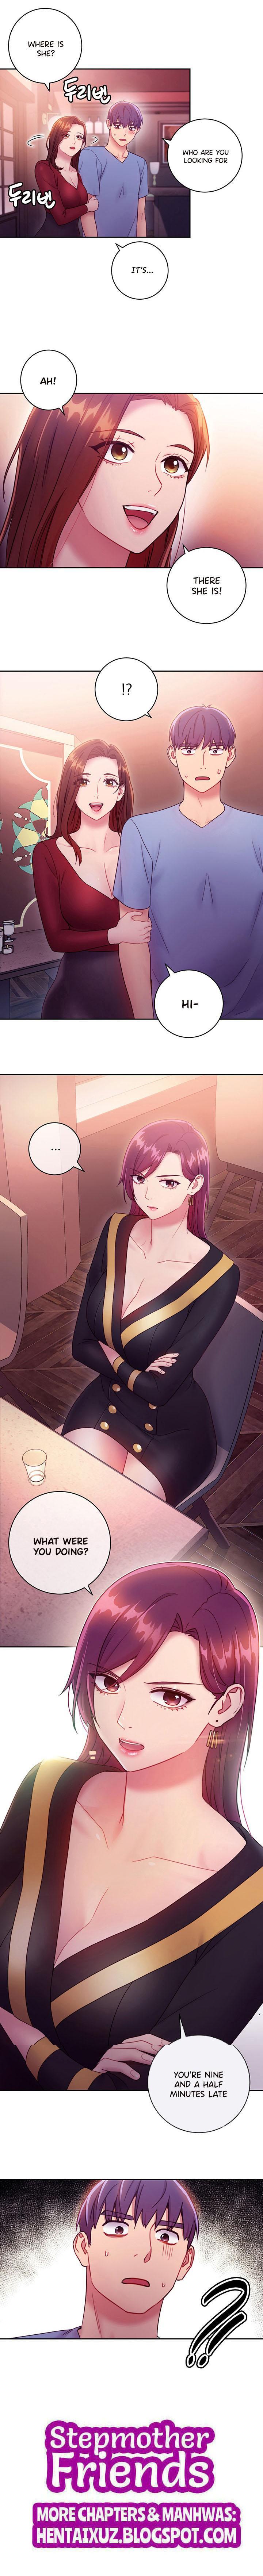 [Neck Pilllow] Stepmother Friends Ch.39/? [English] [Hentai Universe] NEW! 13/10/2020 326